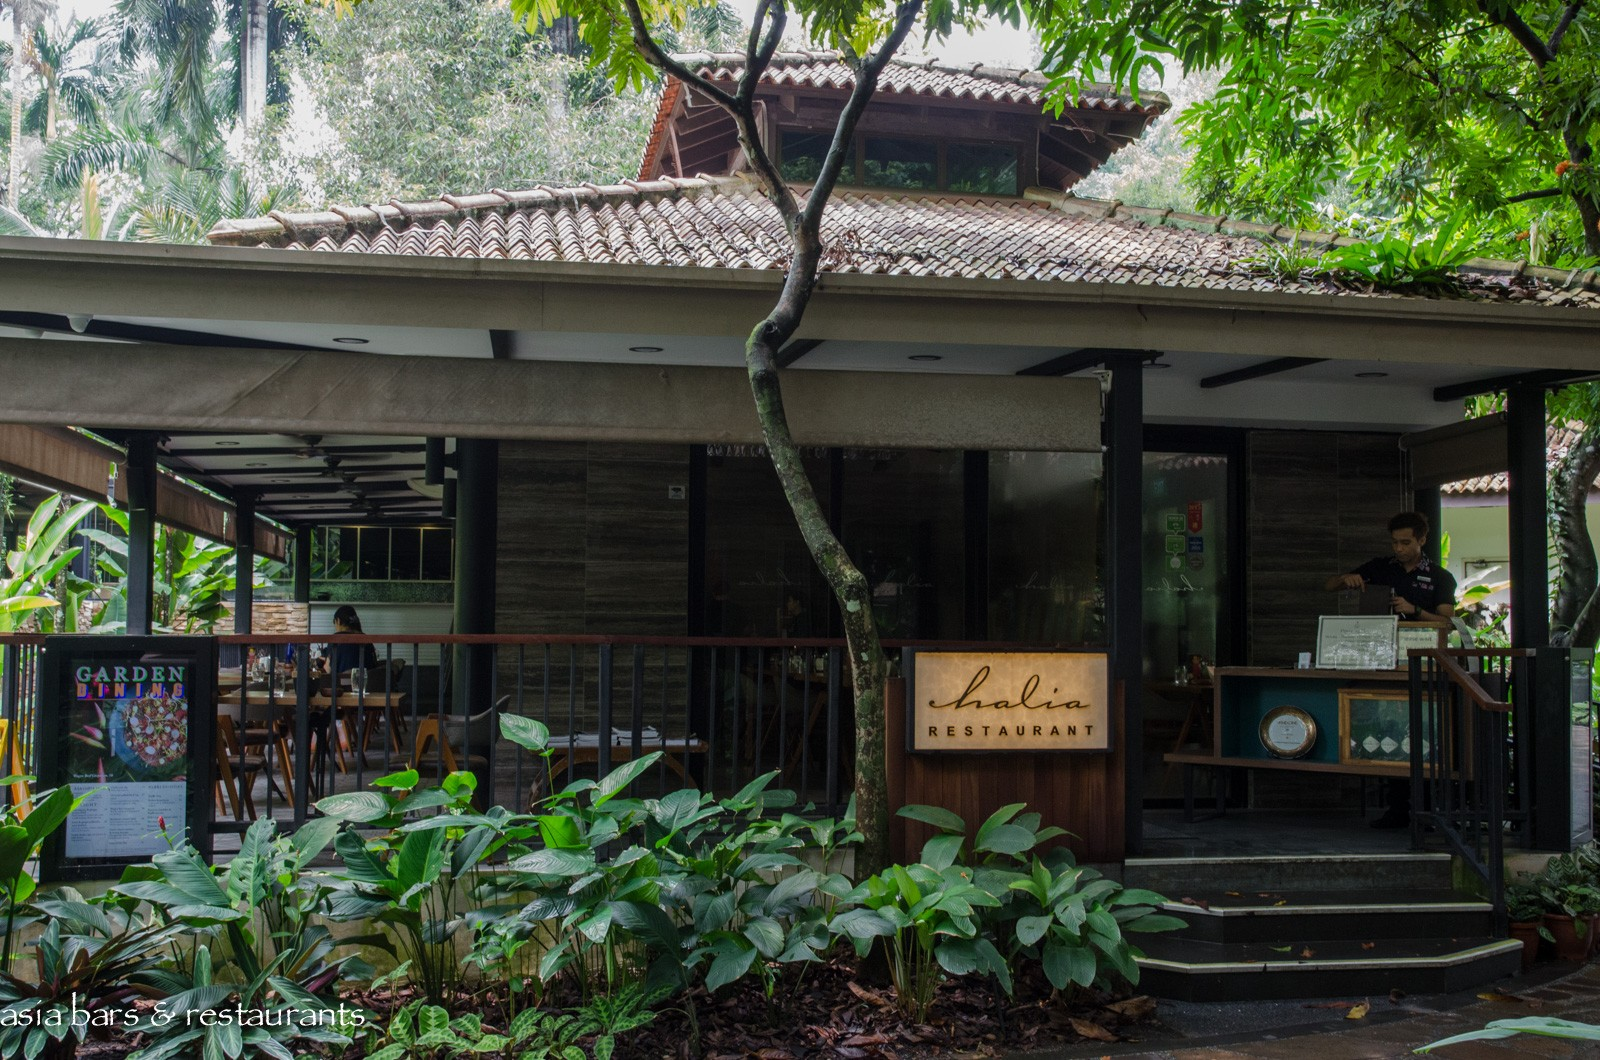 November 18th, 2015. Halia At Singapore Botanic Gardens ...